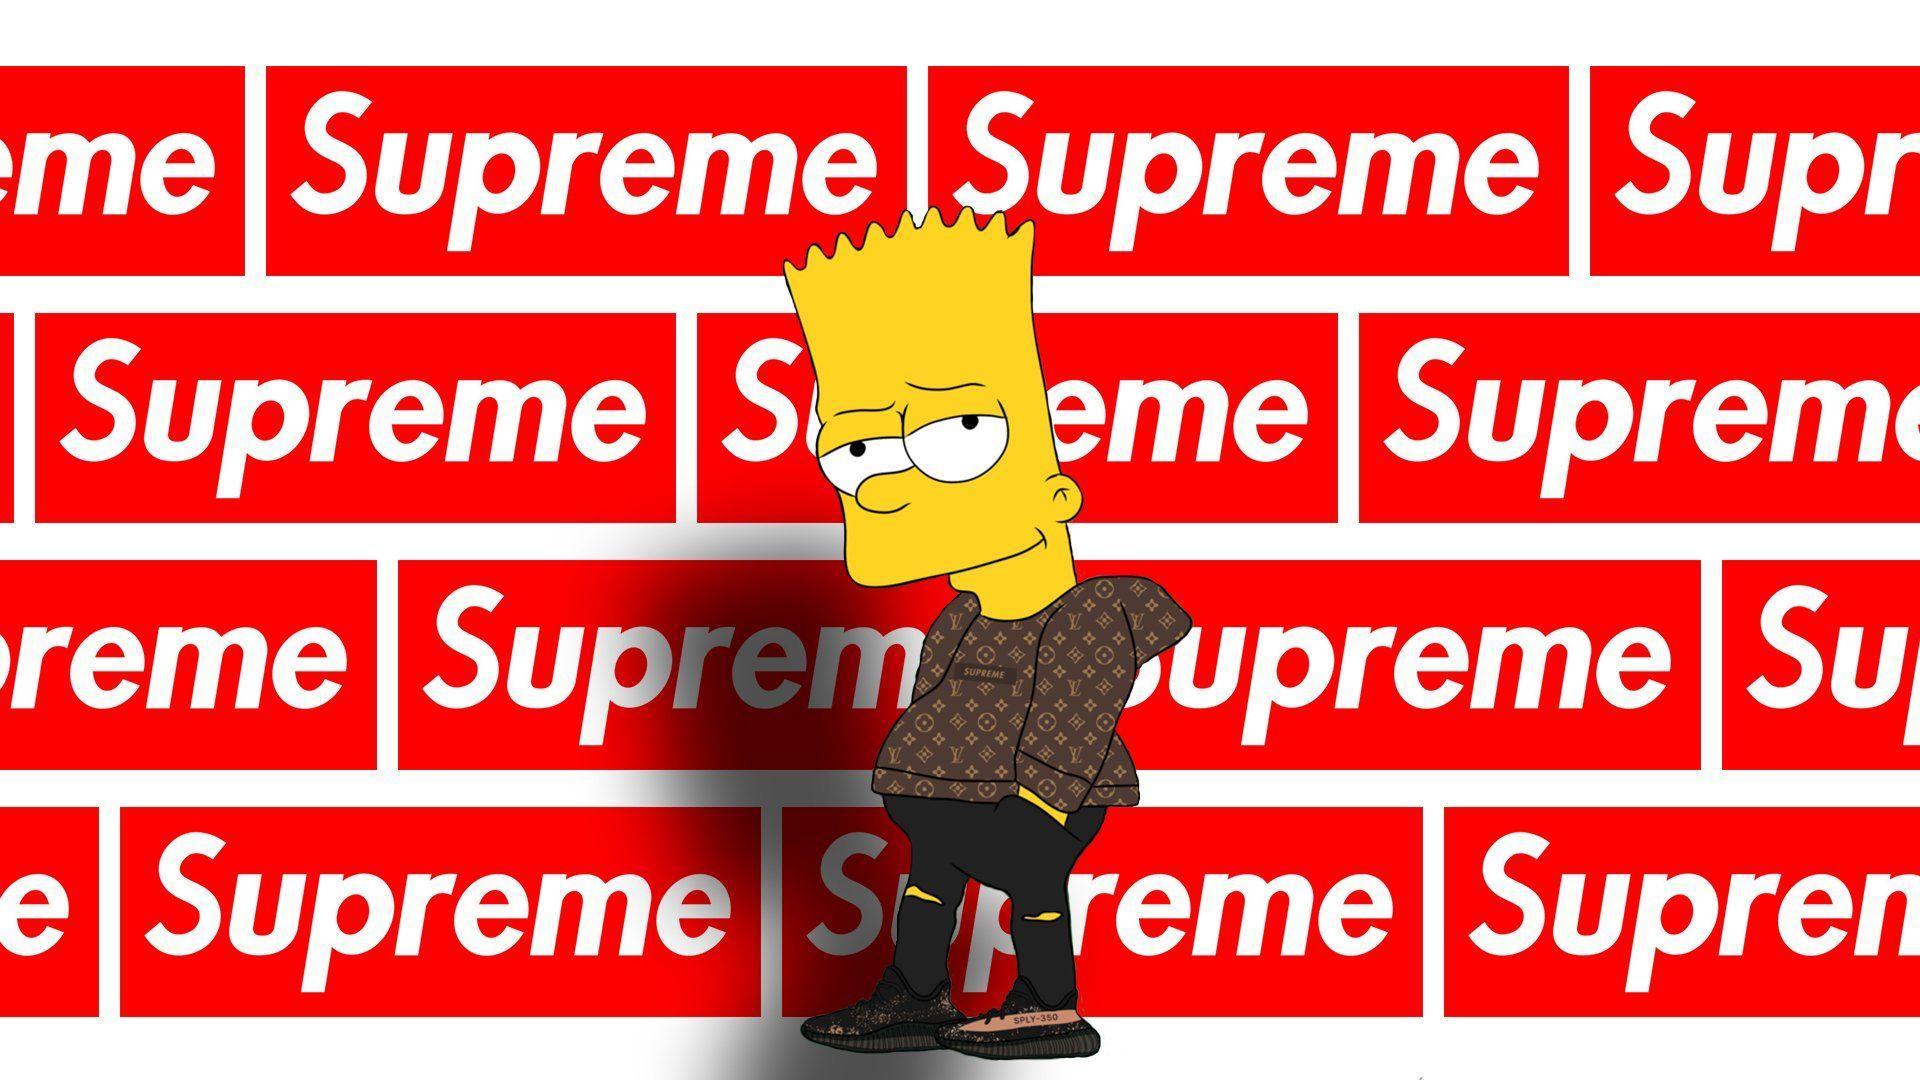 Supreme HD Wallpapers